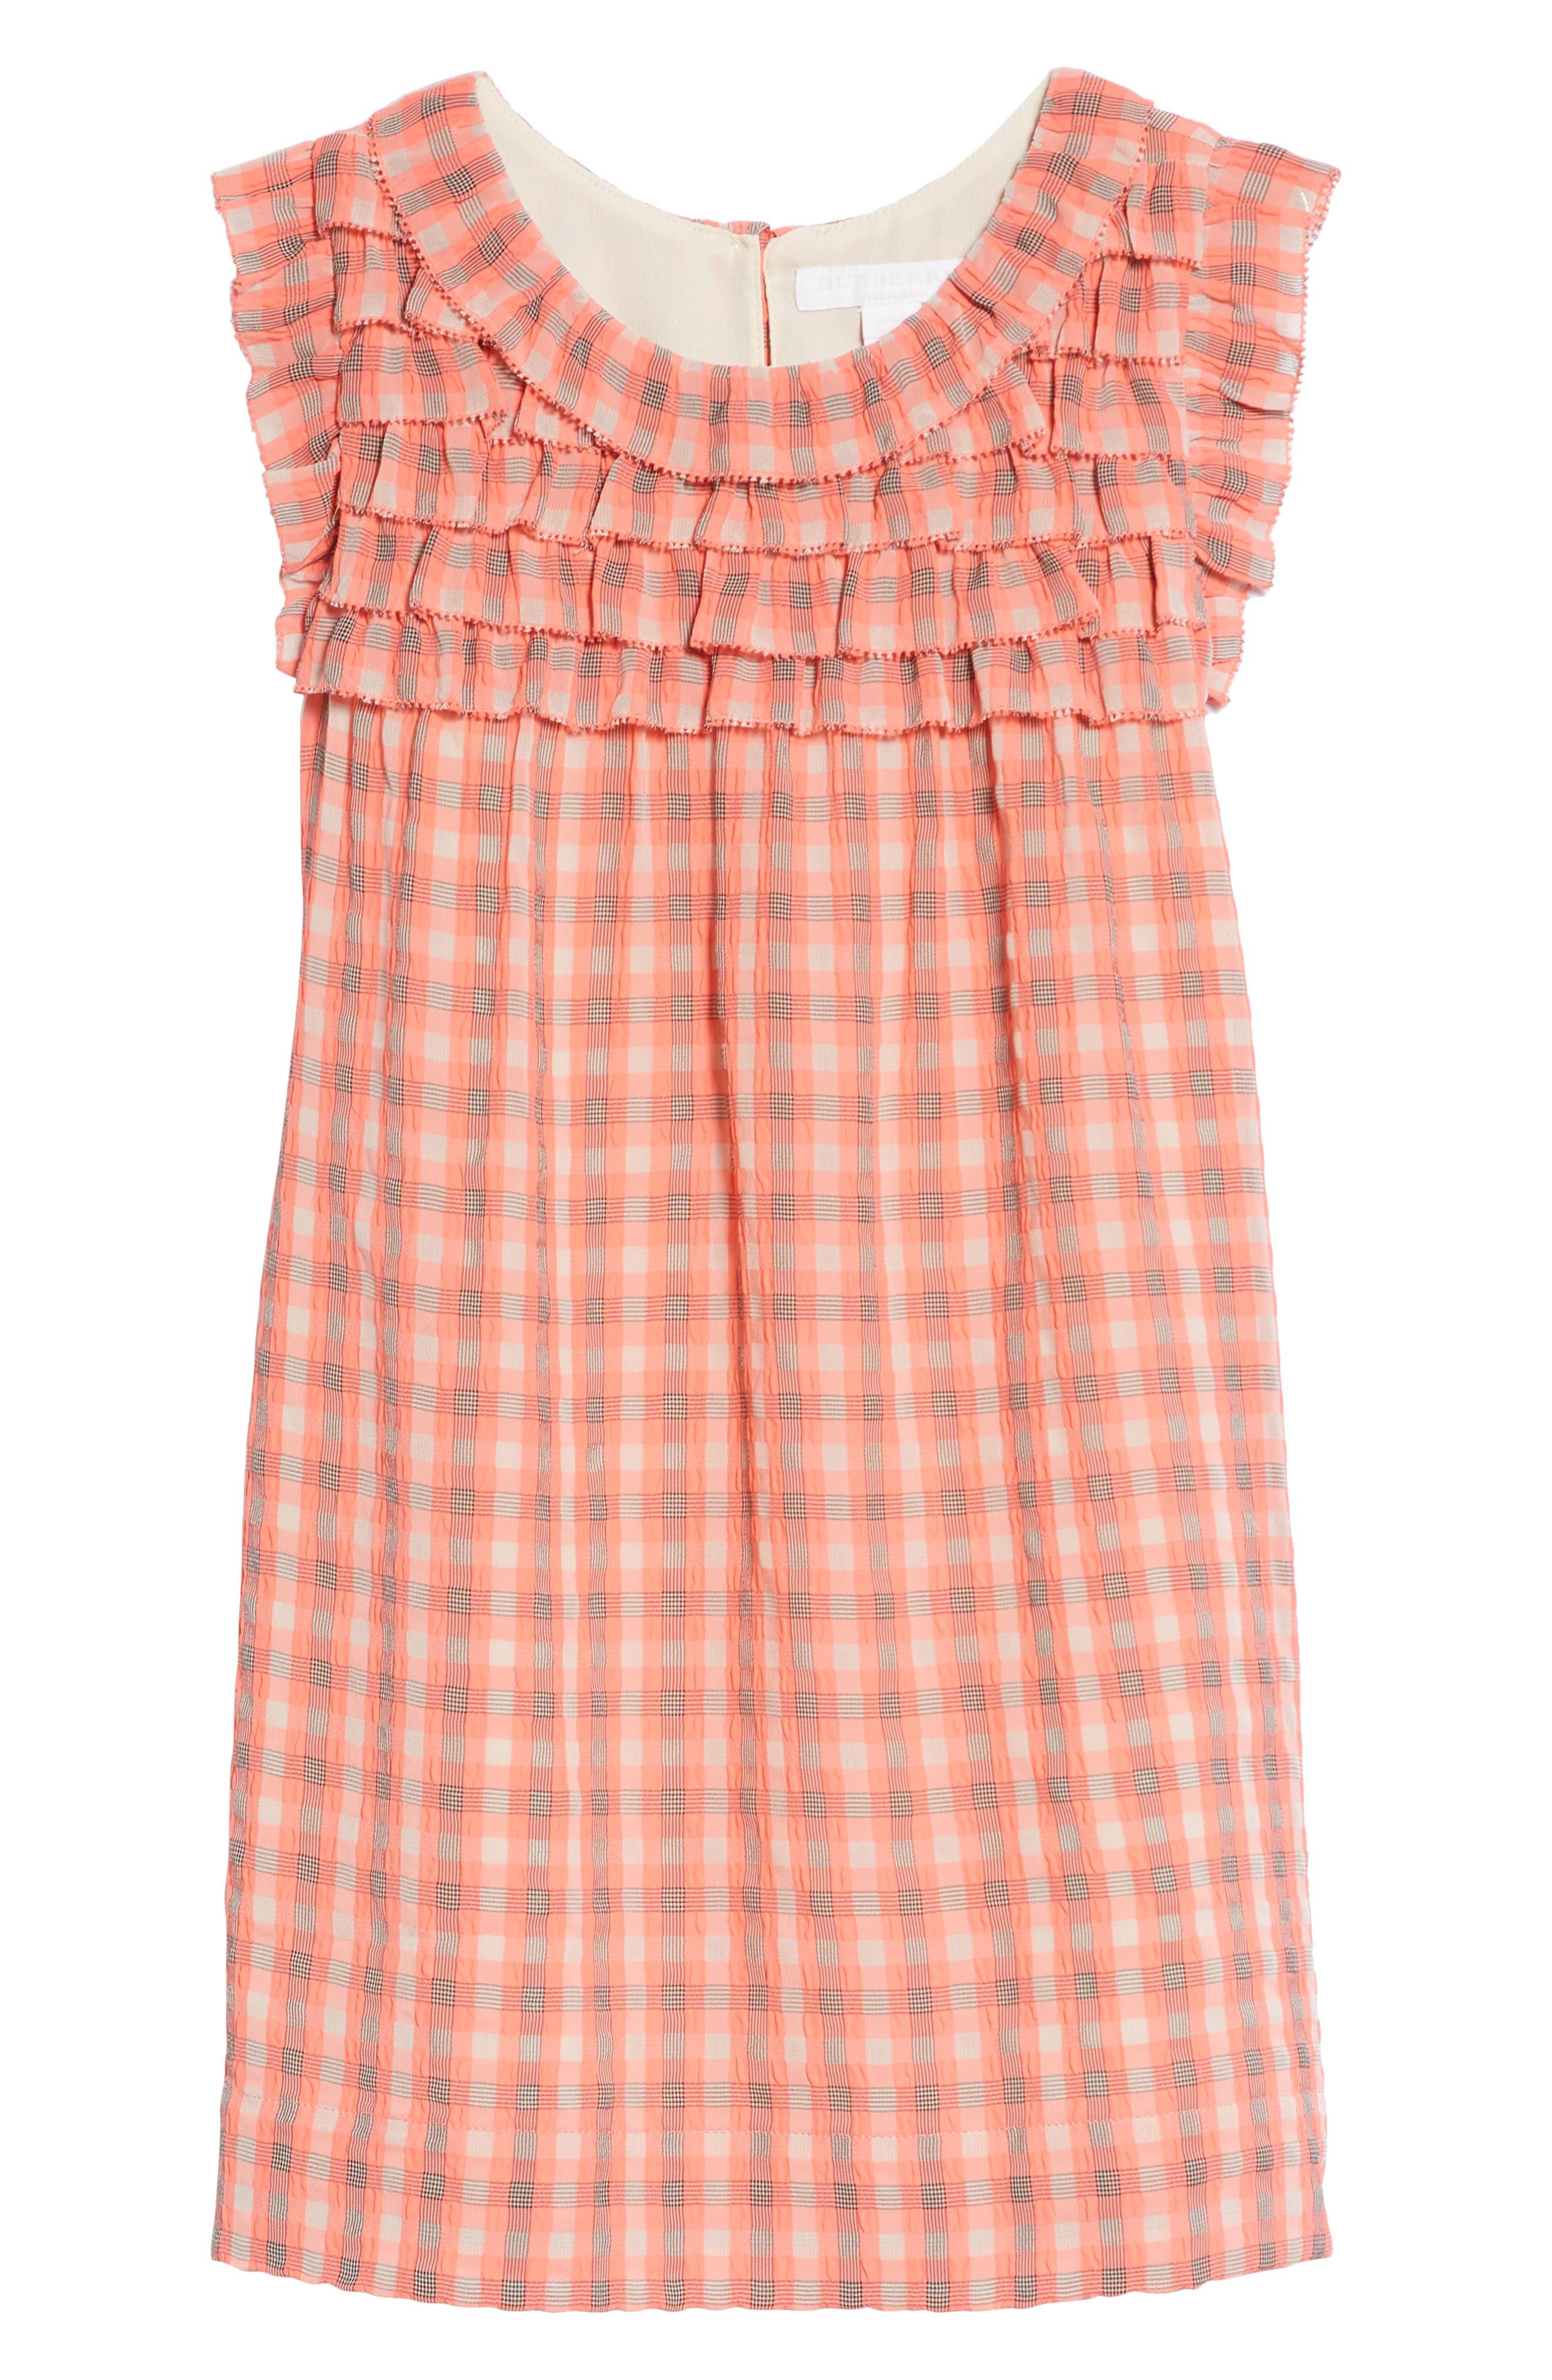 Alternate Image 1 Selected - Burberry Magnoly Check Ruffle Dress (Little Girls & Big Girls)